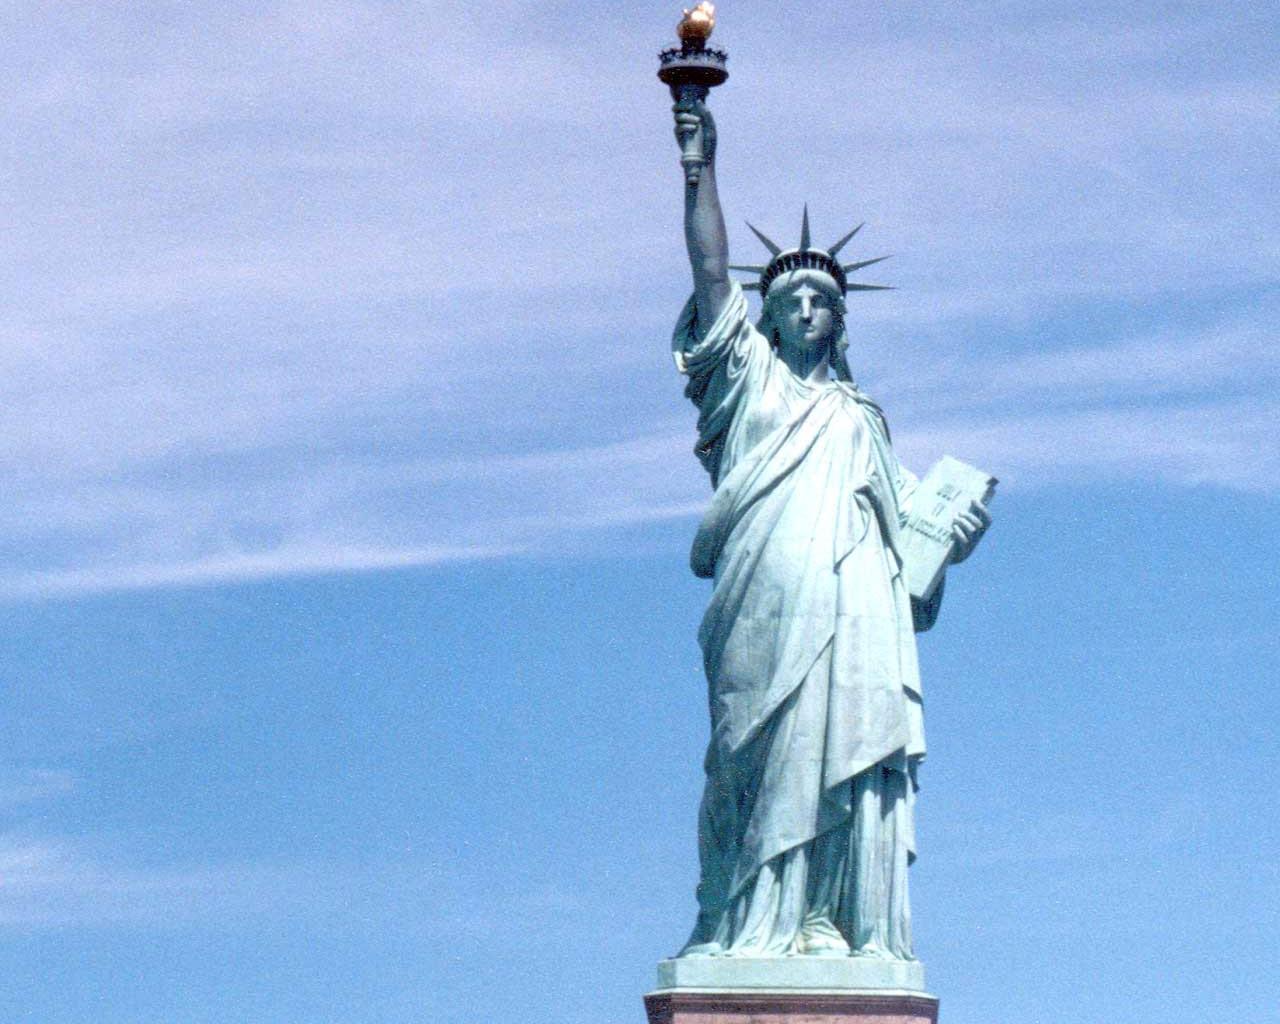 Statue of Liberty Silhouette Statue of Liberty Night Wallpaper Statue 1280x1024